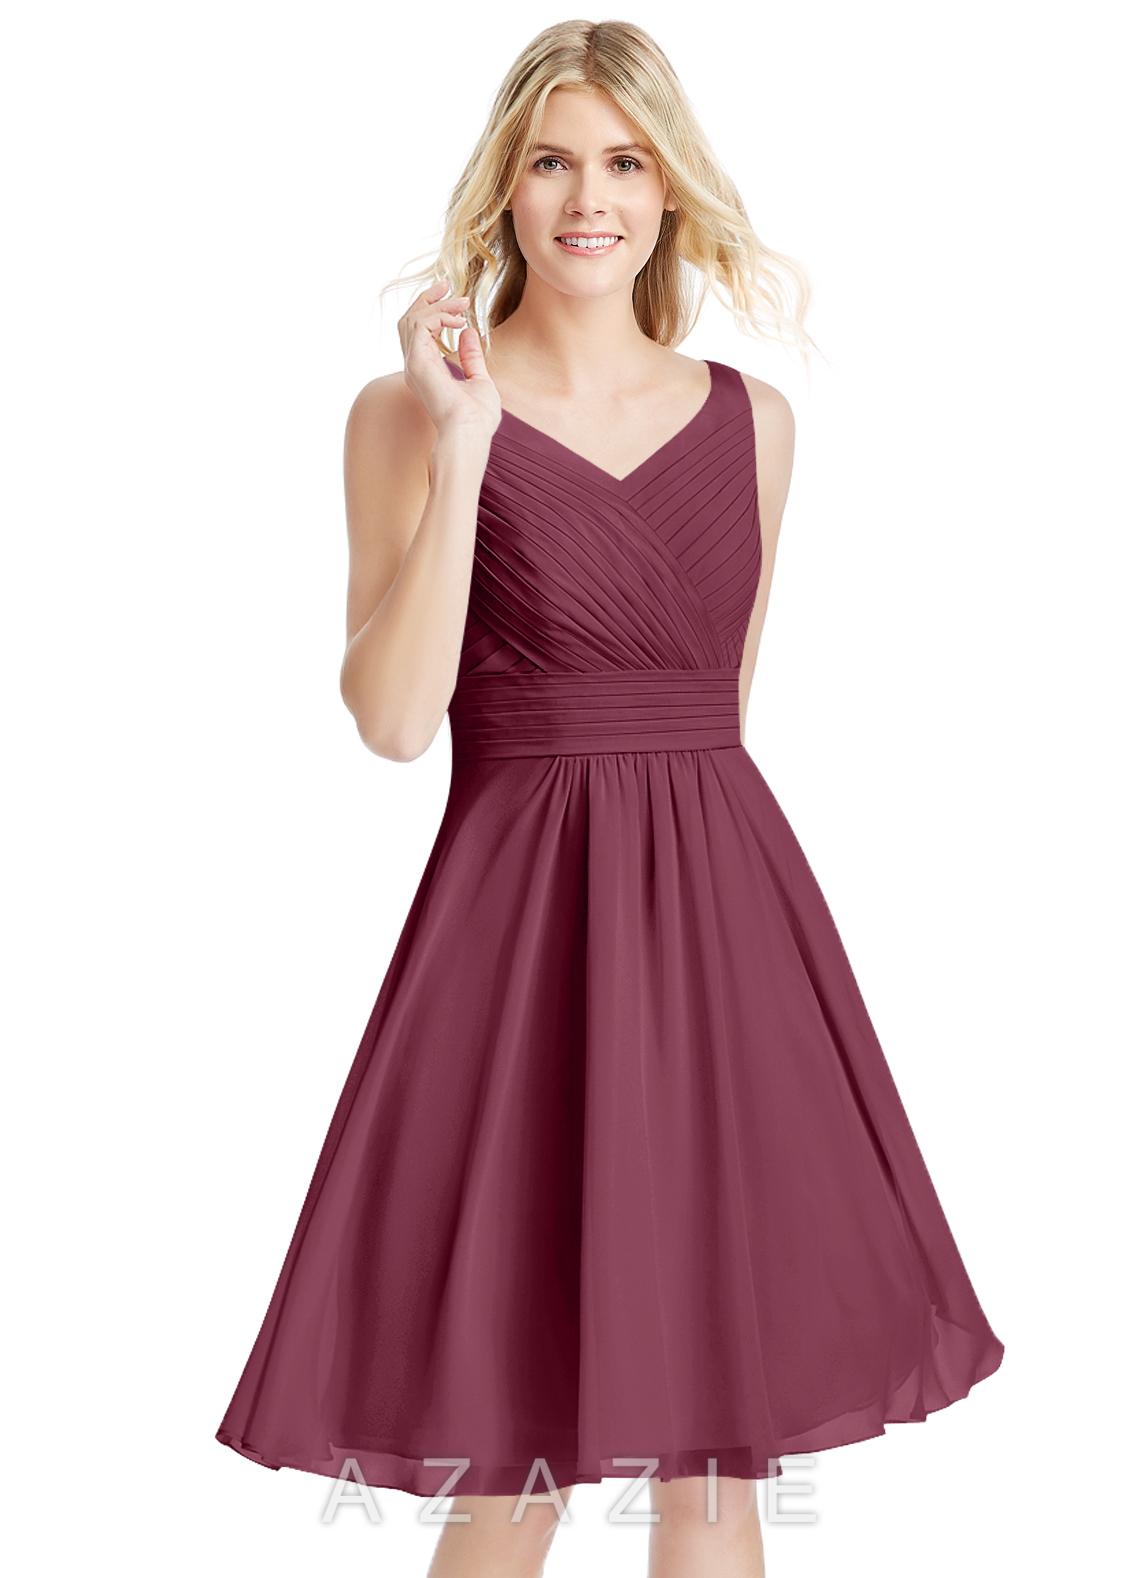 5a07042238 Azazie Grace Bridesmaid Dress